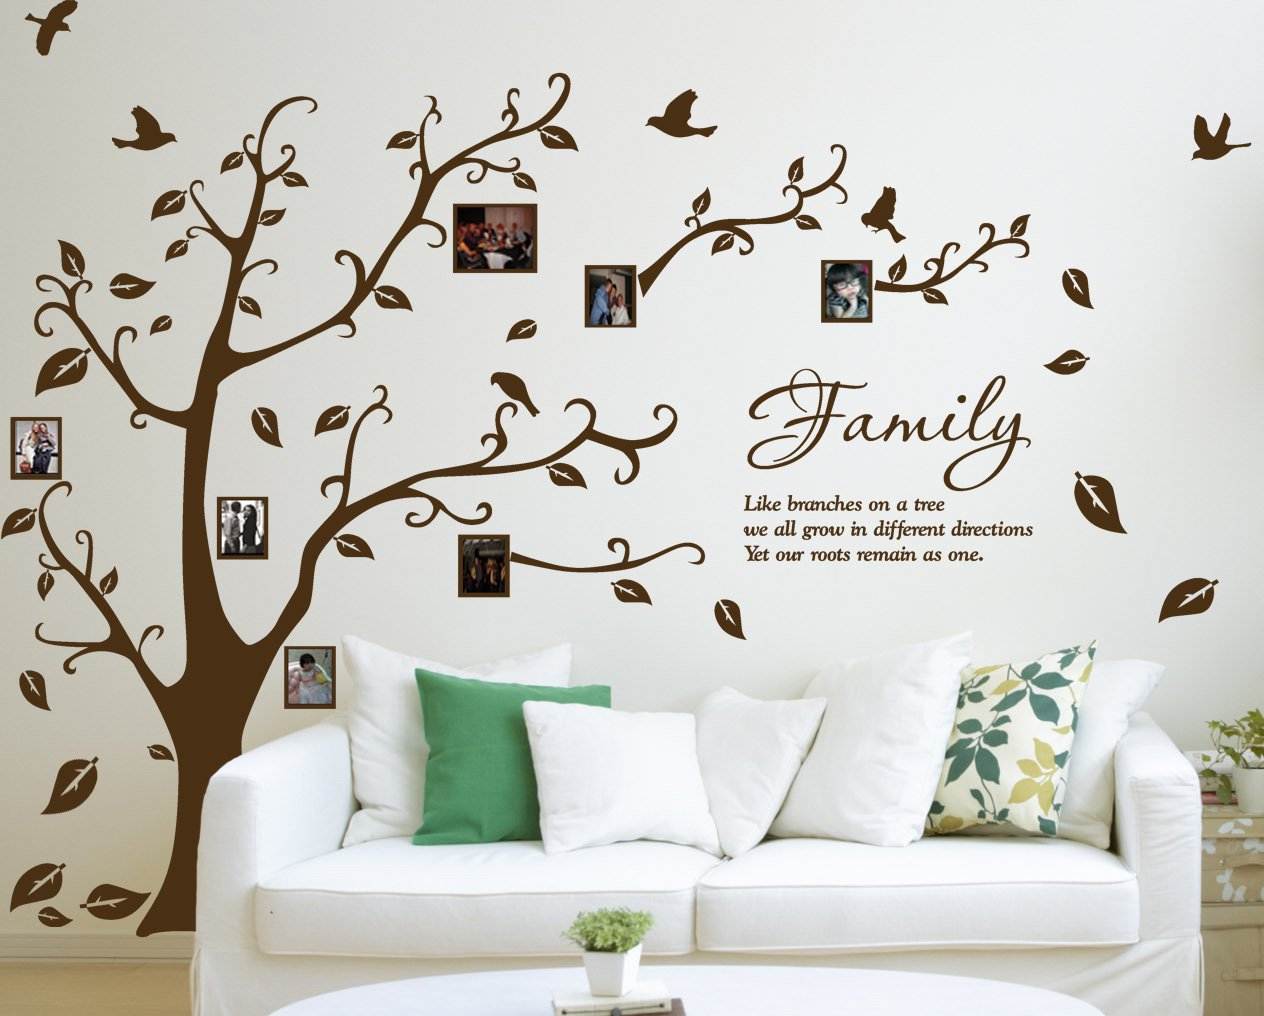 [X Large] Family Photo Tree U0026 Birds Art Vinyl Wall Sticker, DIY Wall Decal